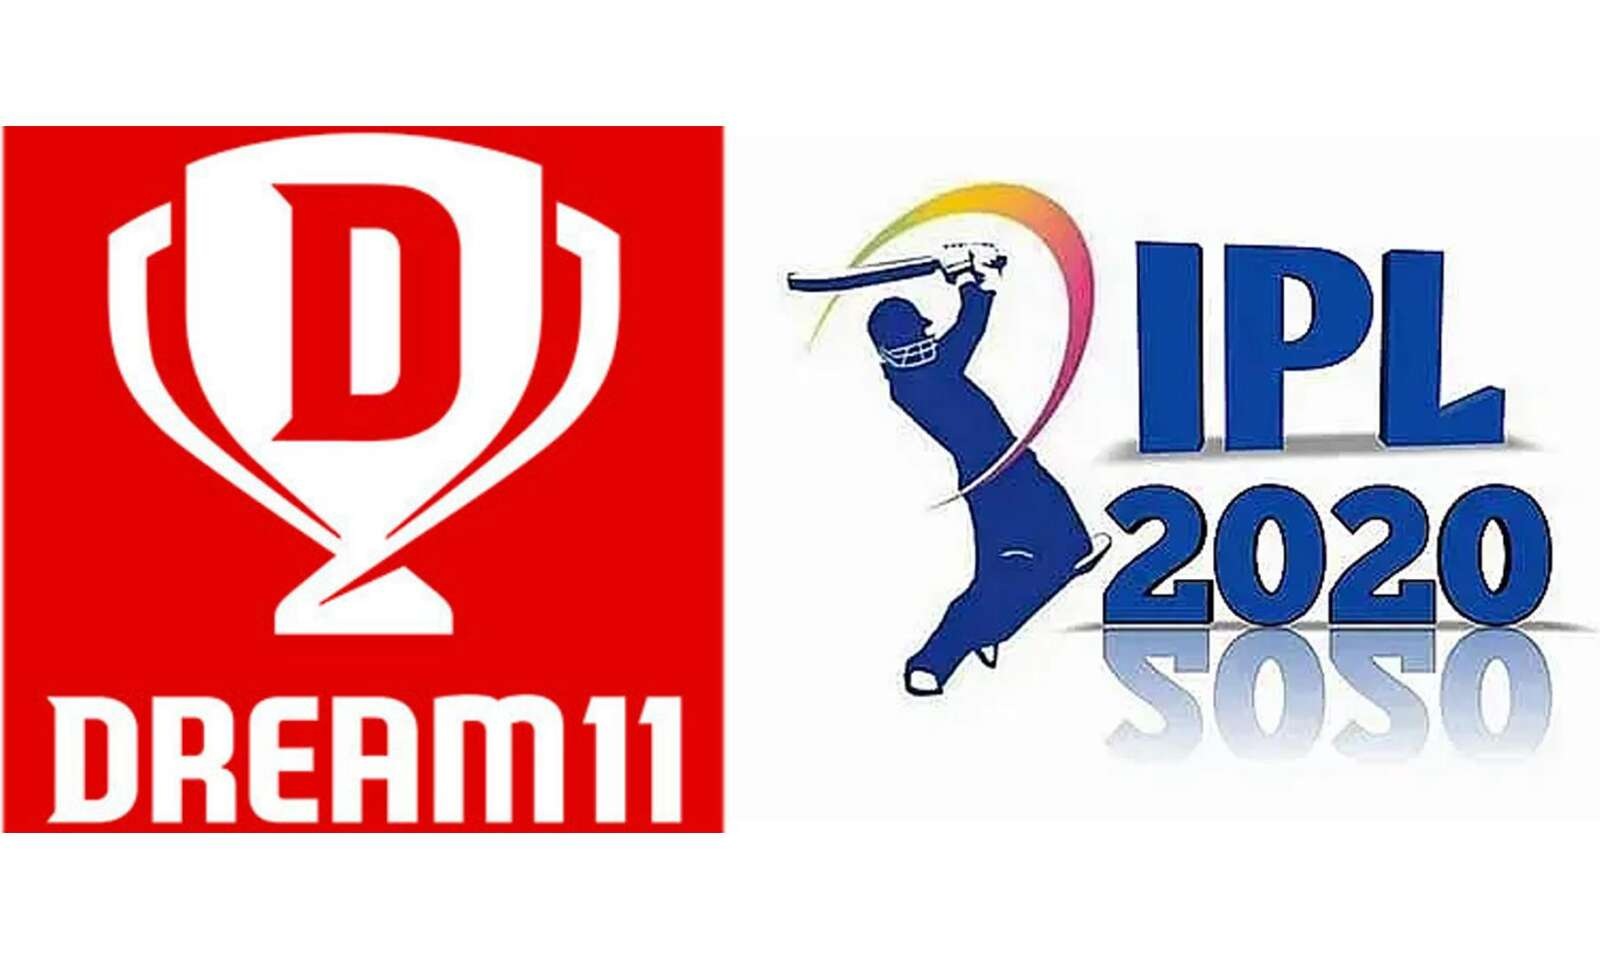 Fantasy league platform 'Dream11' gets title sponsorship rights ...